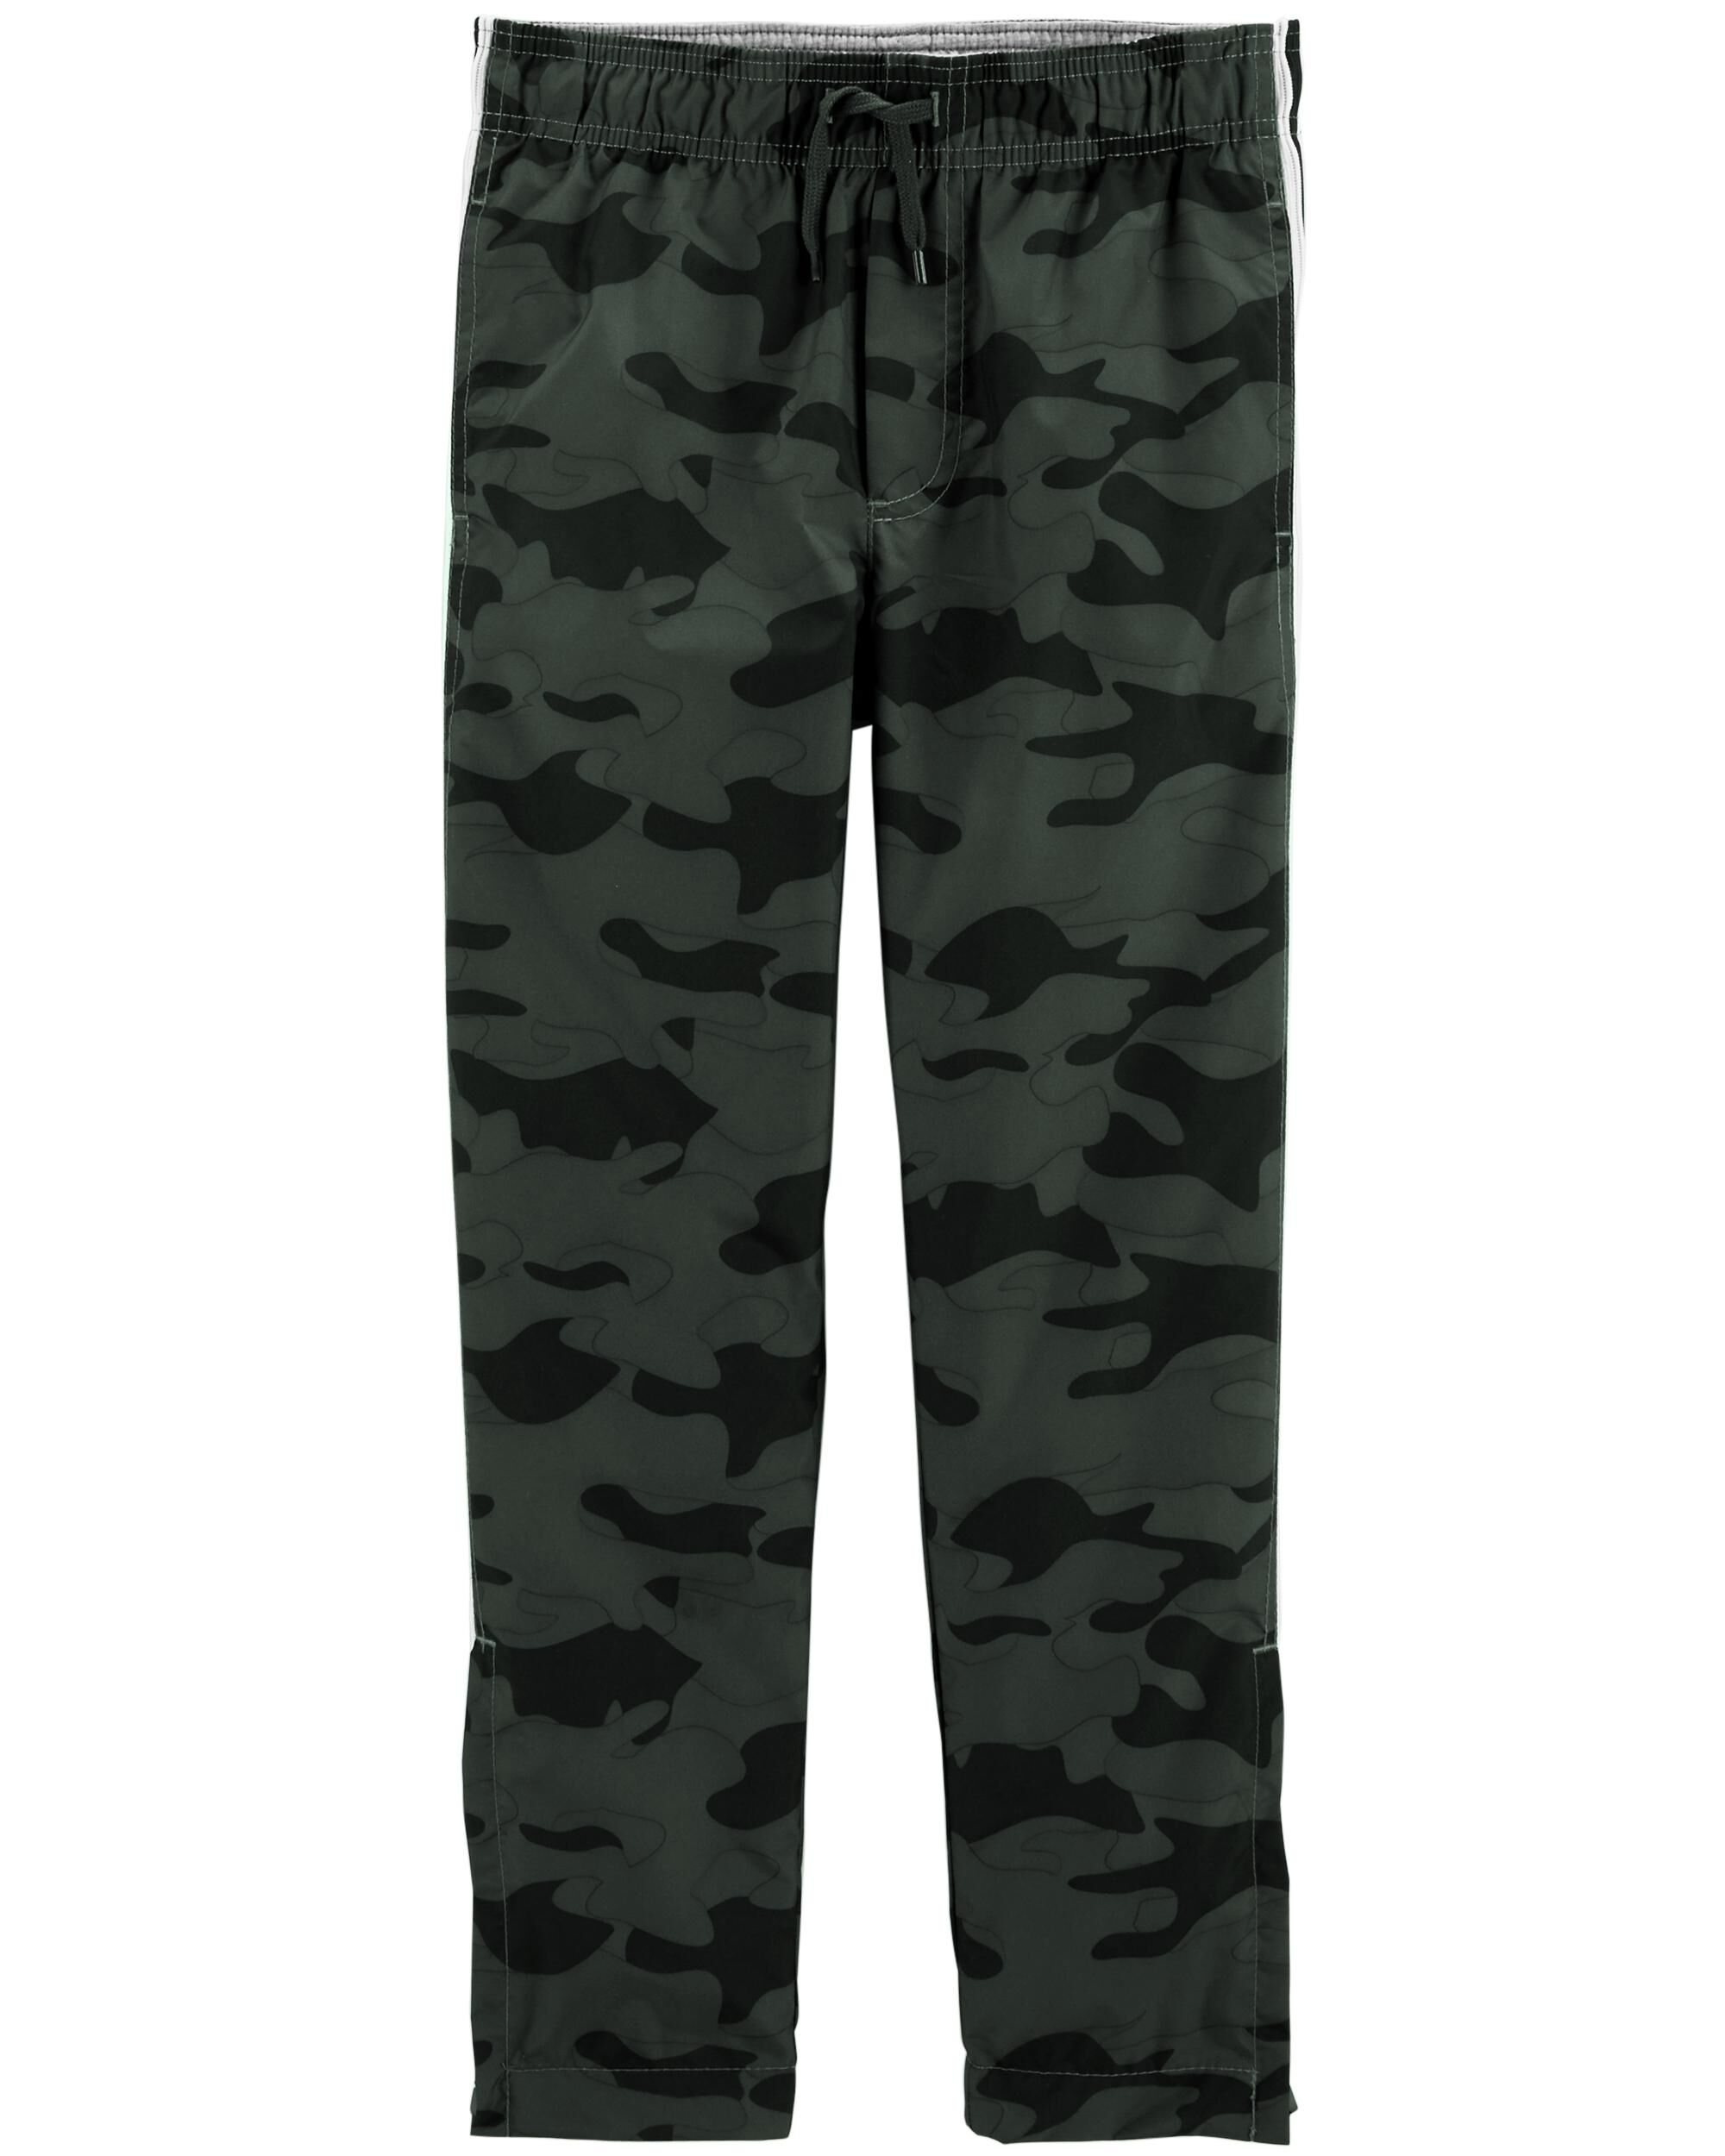 bec8946083d03 Active Camo Pants | OshKosh.com